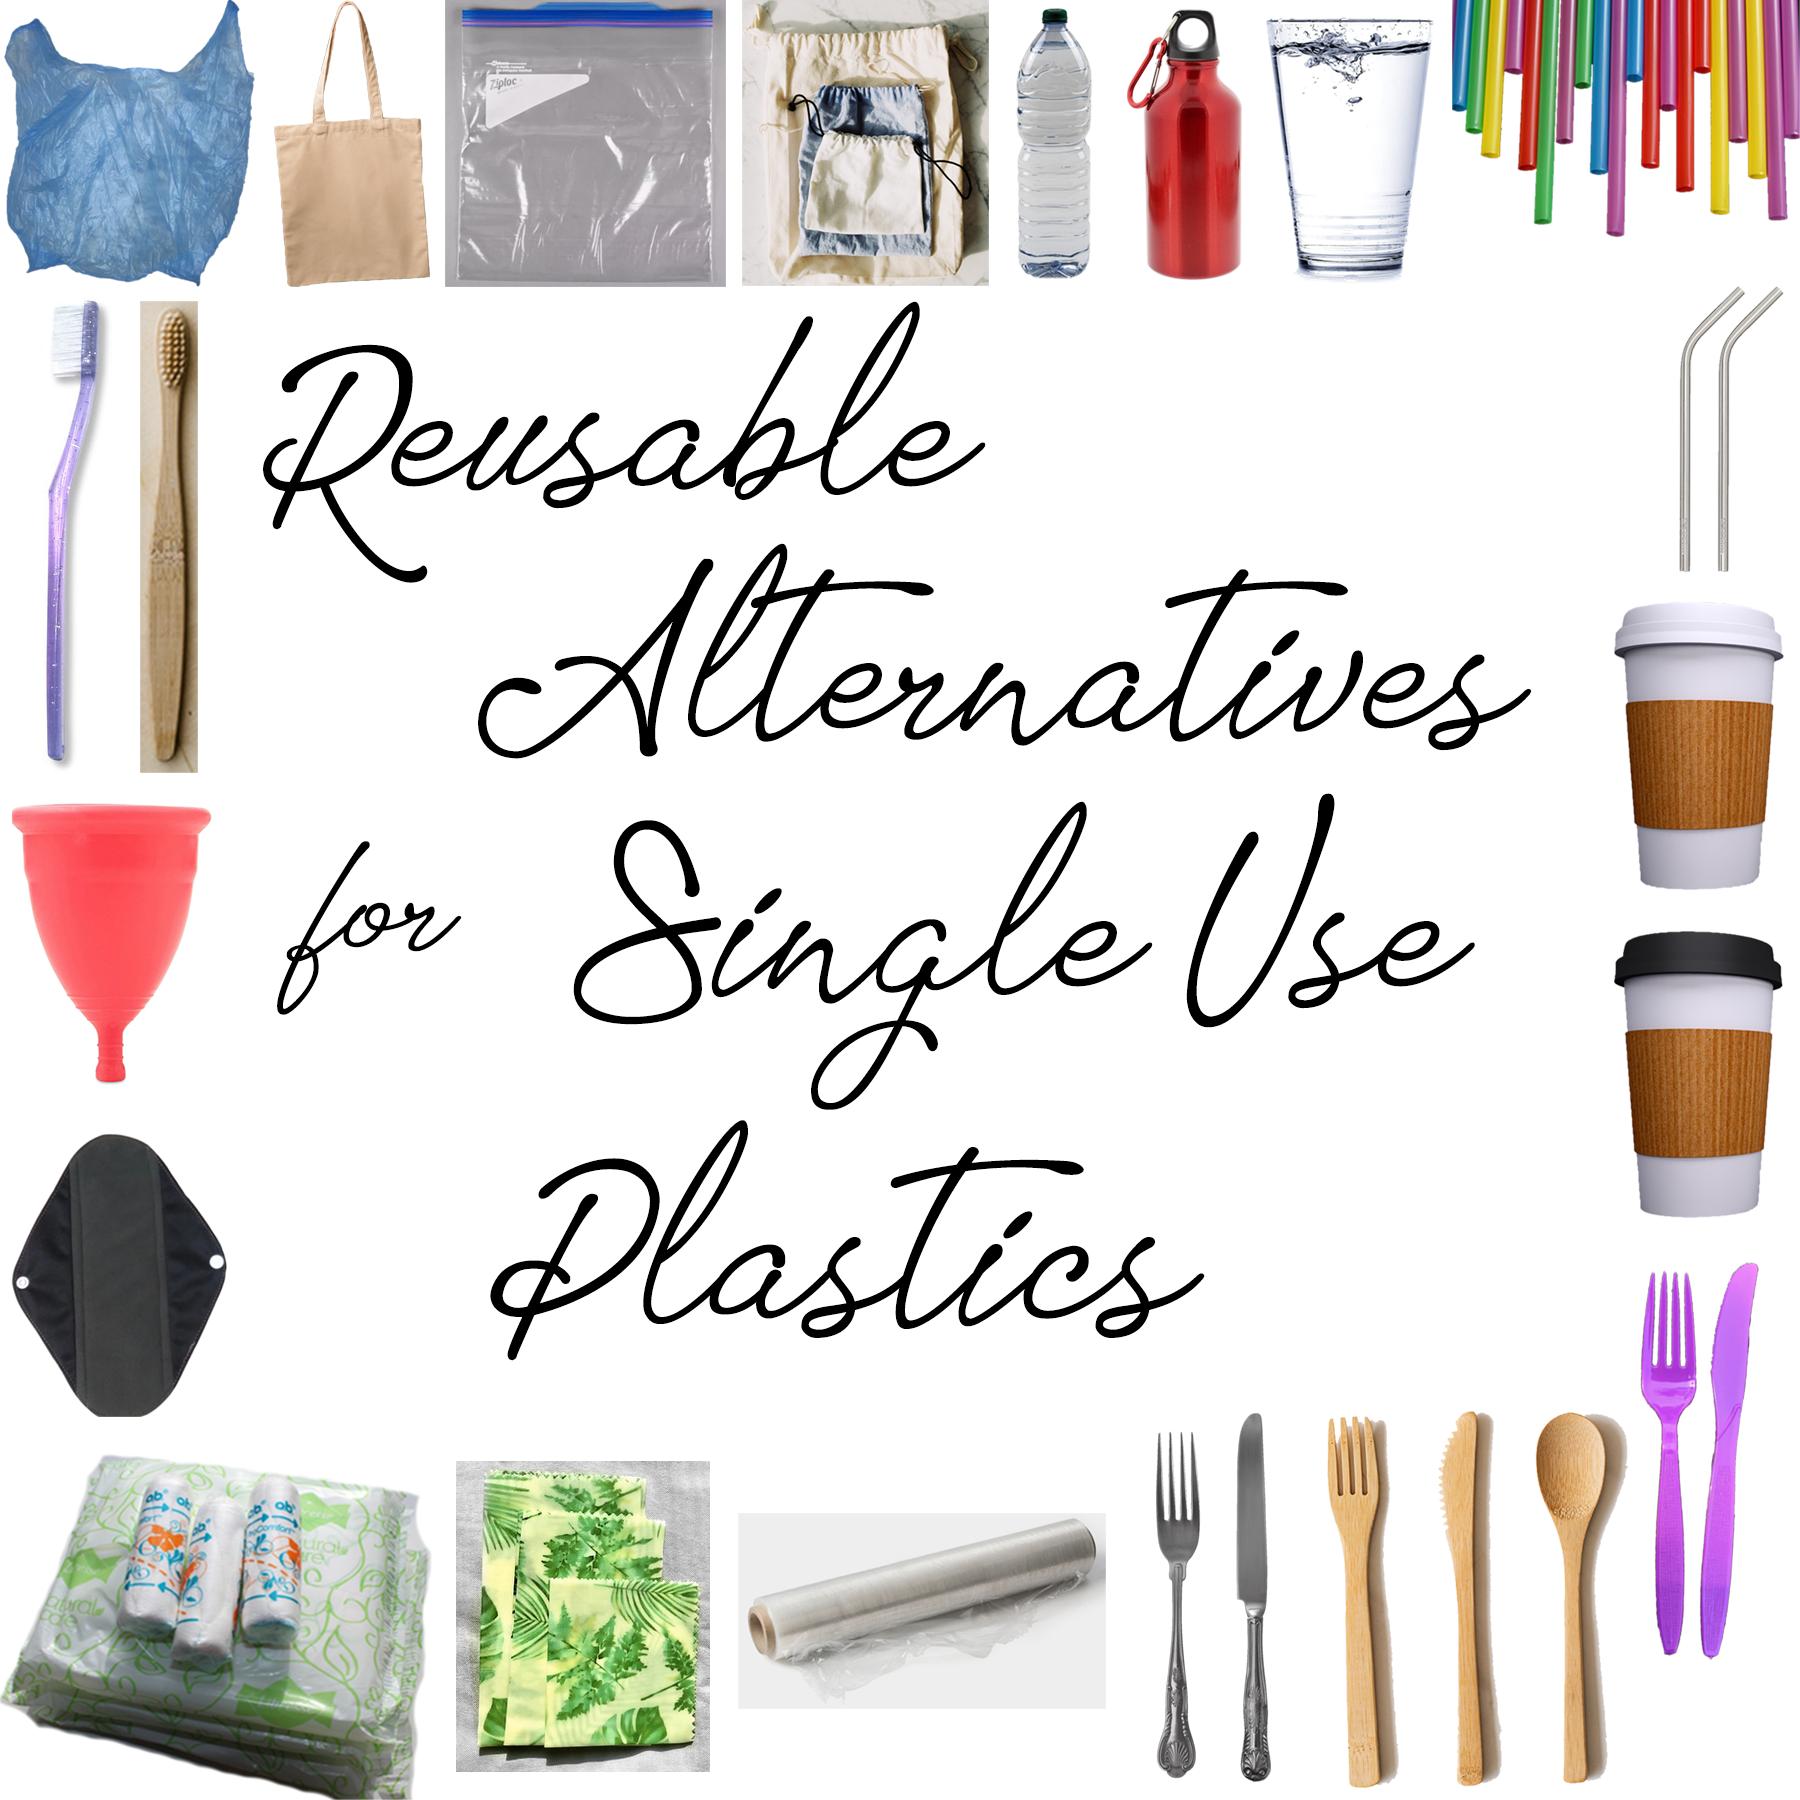 AterImber.com - No Mad - Reusable Alternatives for Single Use Plastics - Nutrient Collage Series - Omega-3's Collage - vegan tips, vegan food, vegan blogger, health tips, nutrients, Omega-3's, vegan food blogger, new vegan tips